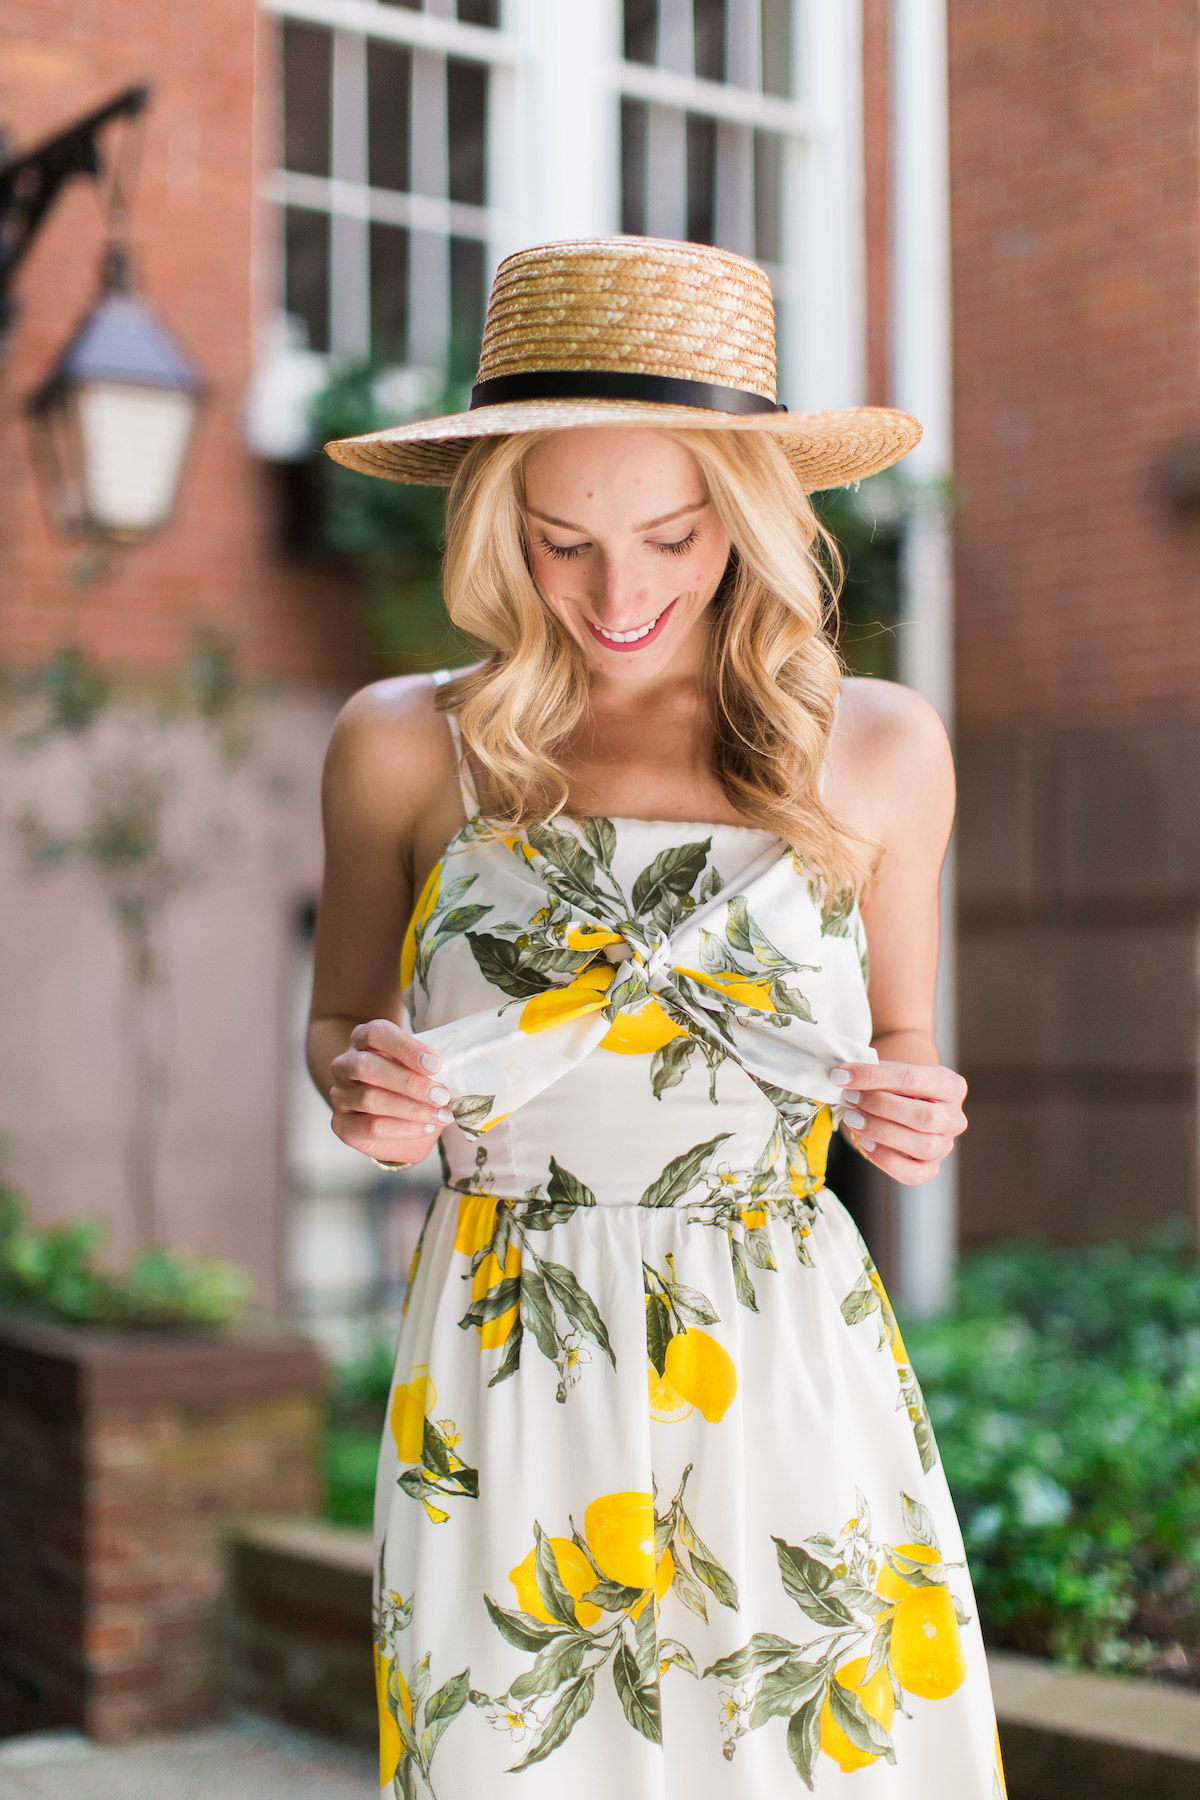 Lemon Print Cocktail Dress